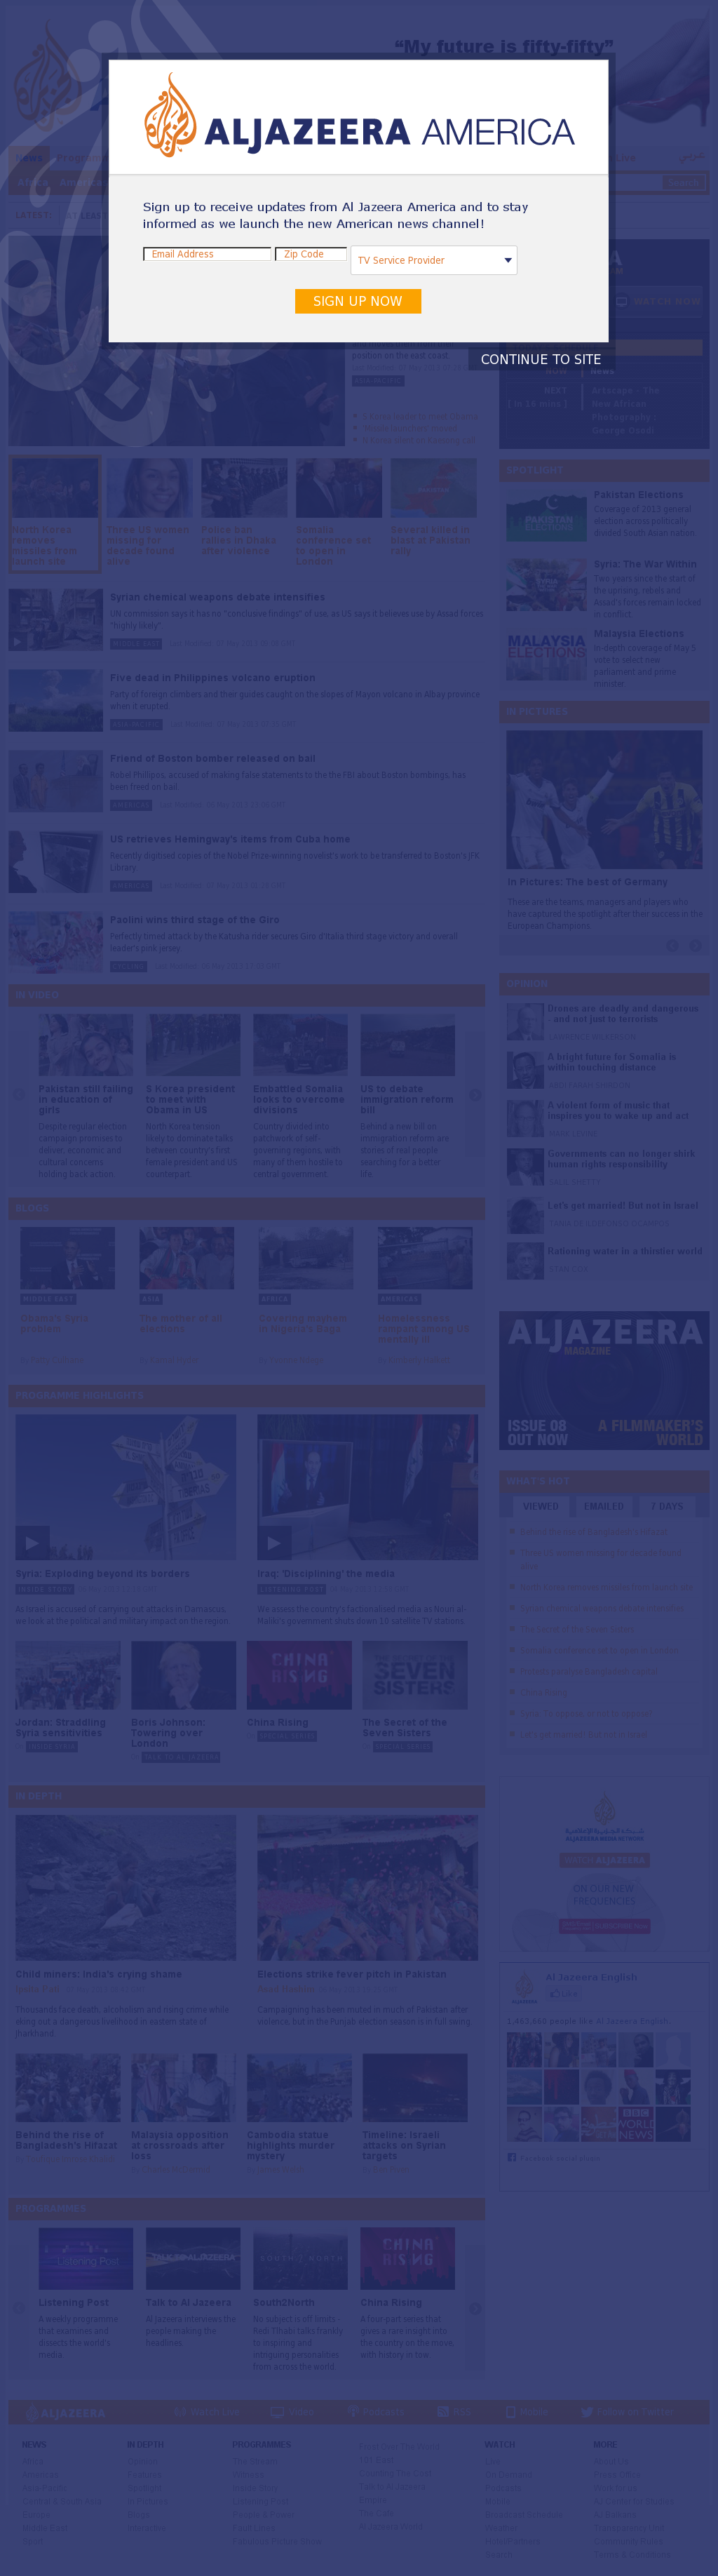 Al Jazeera (English) at Tuesday May 7, 2013, 9:15 a.m. UTC